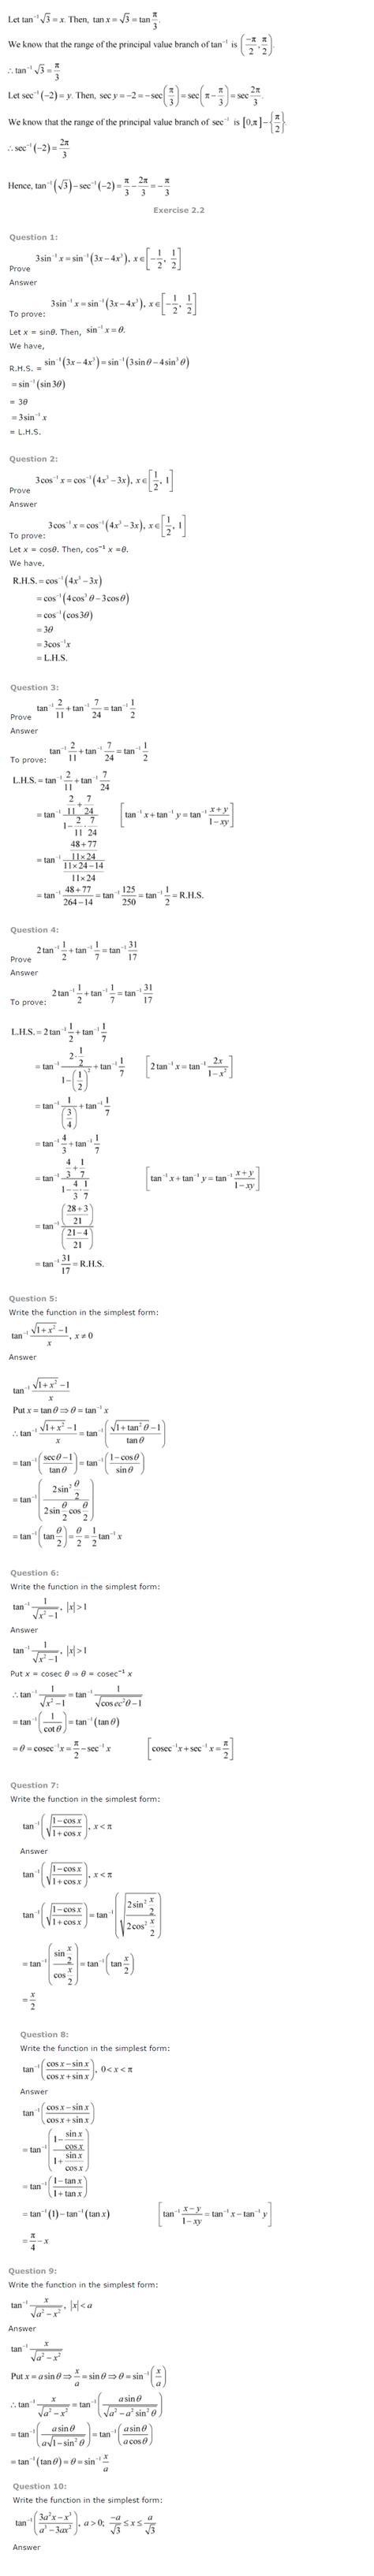 ncert solutions for class 12 maths chapter 2 inverse